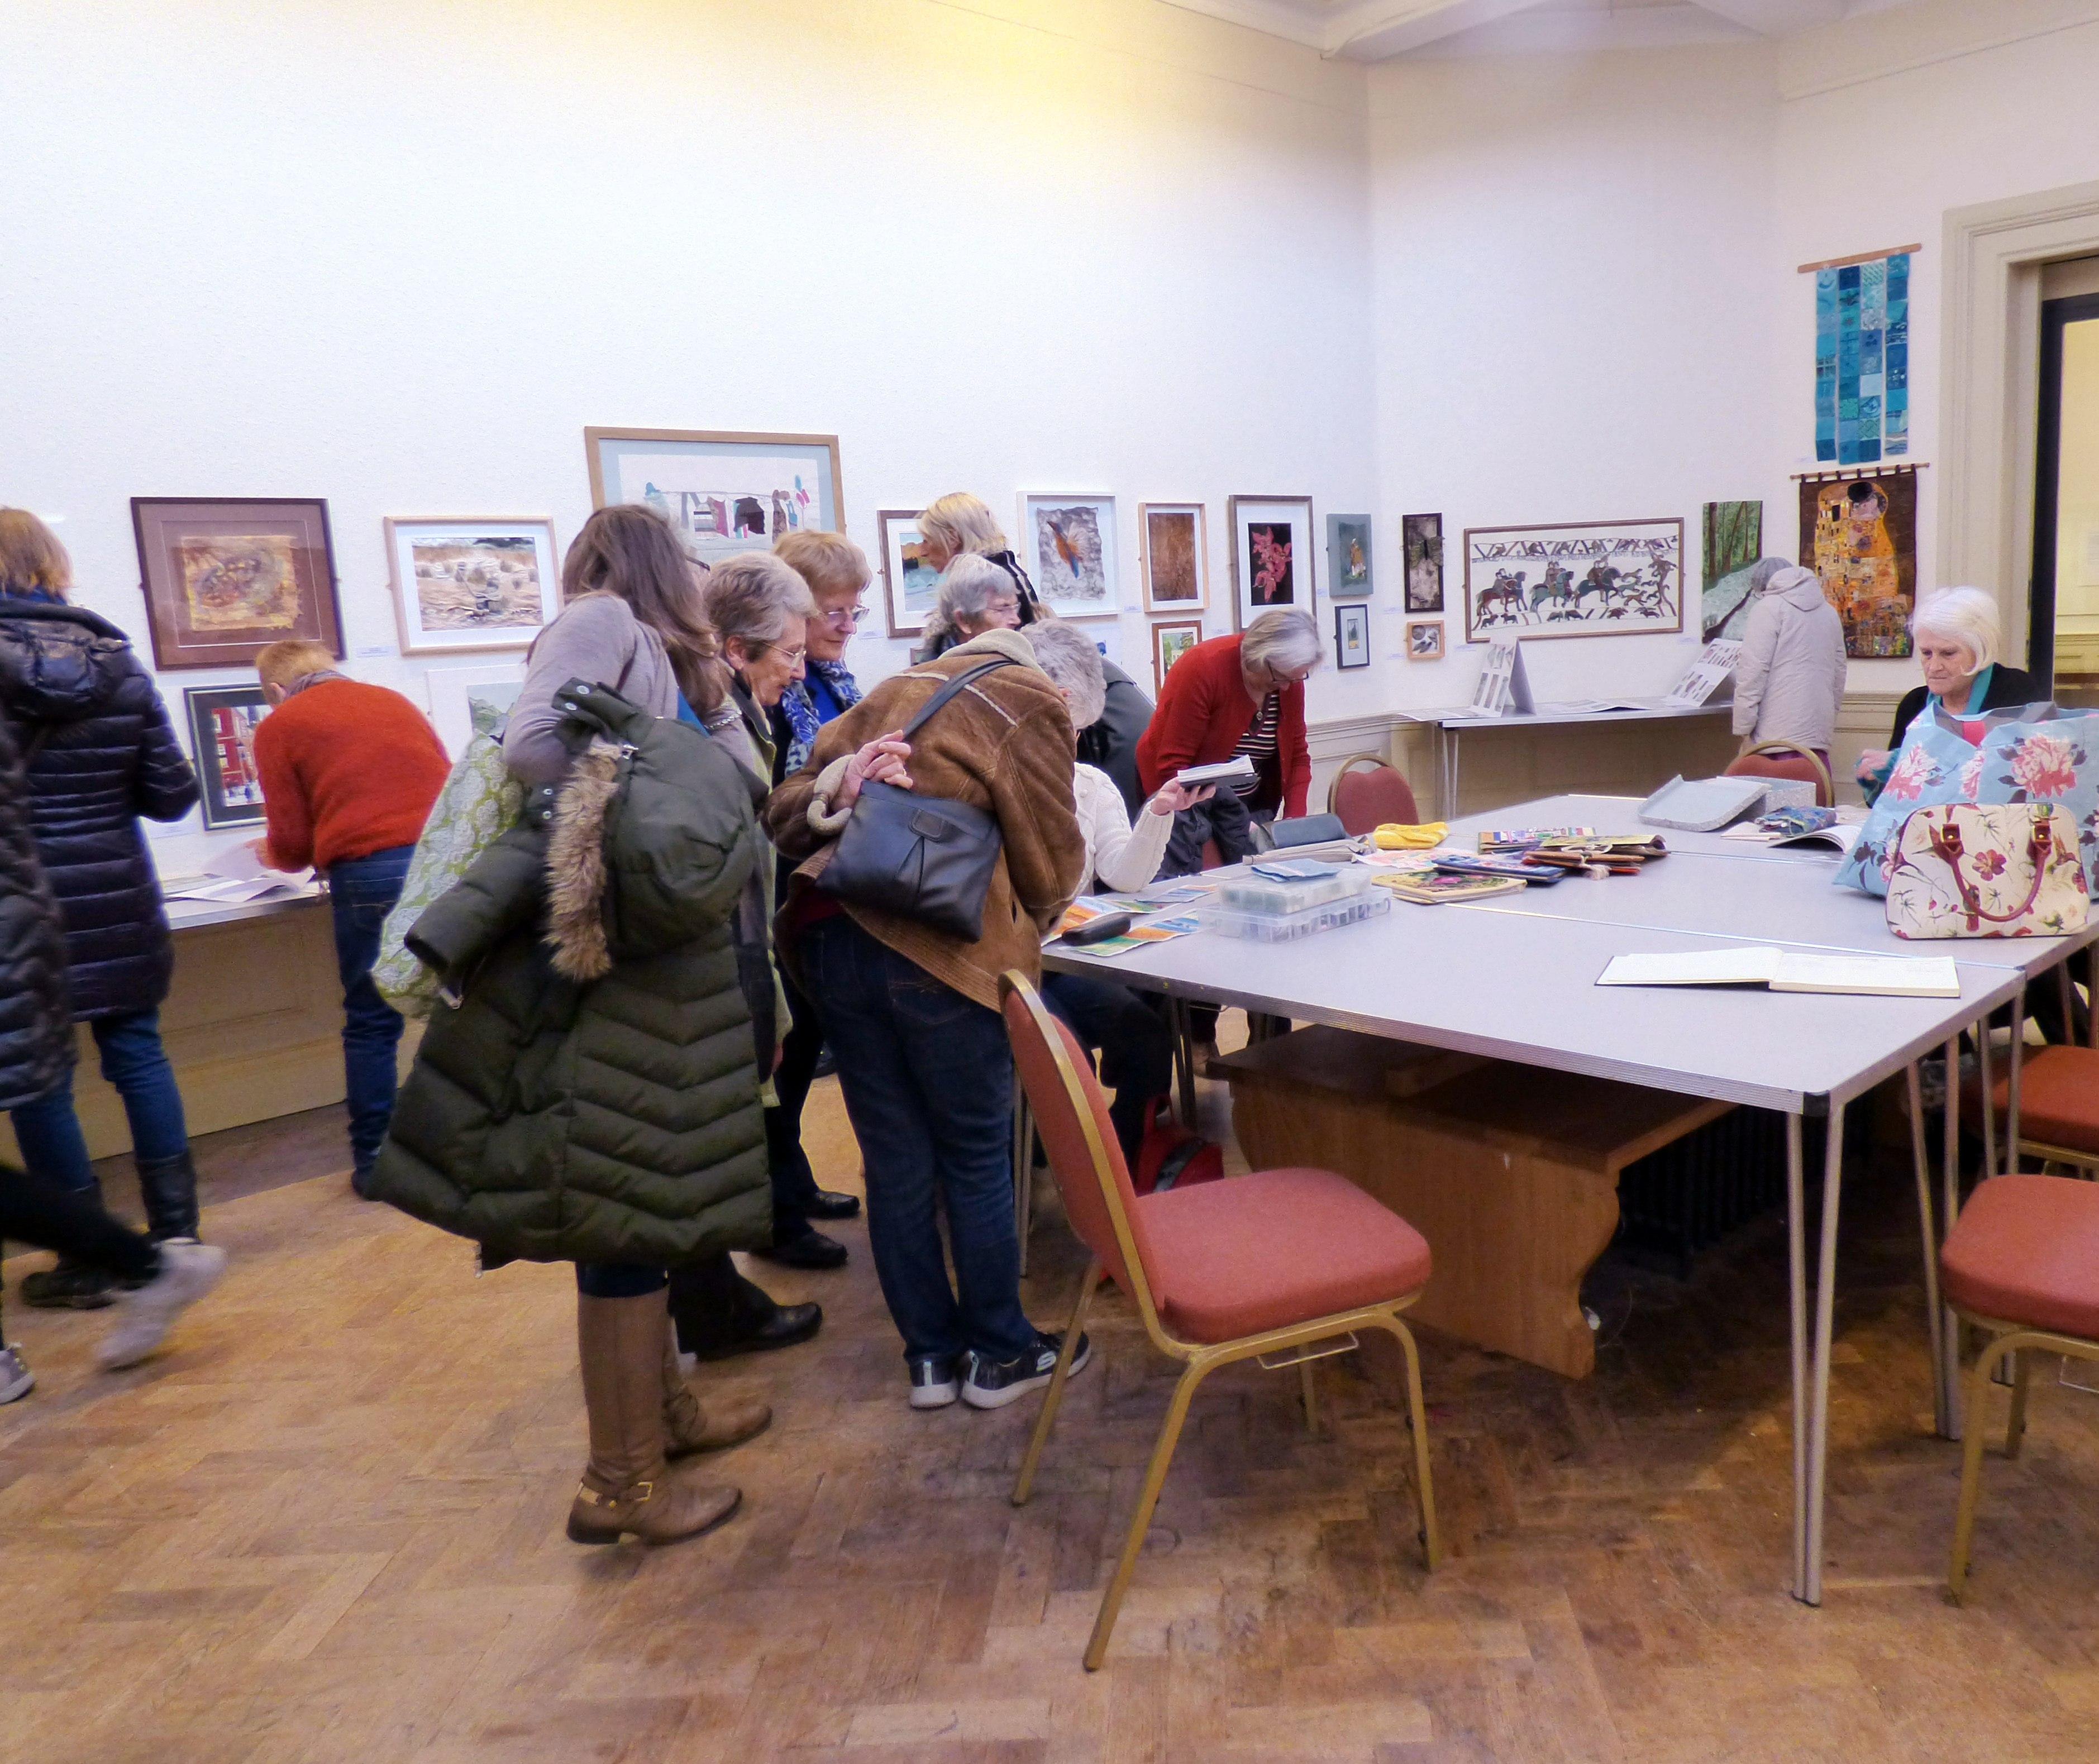 Wirral 20th Birthday exhibition, Williamson Art Gallery 2017